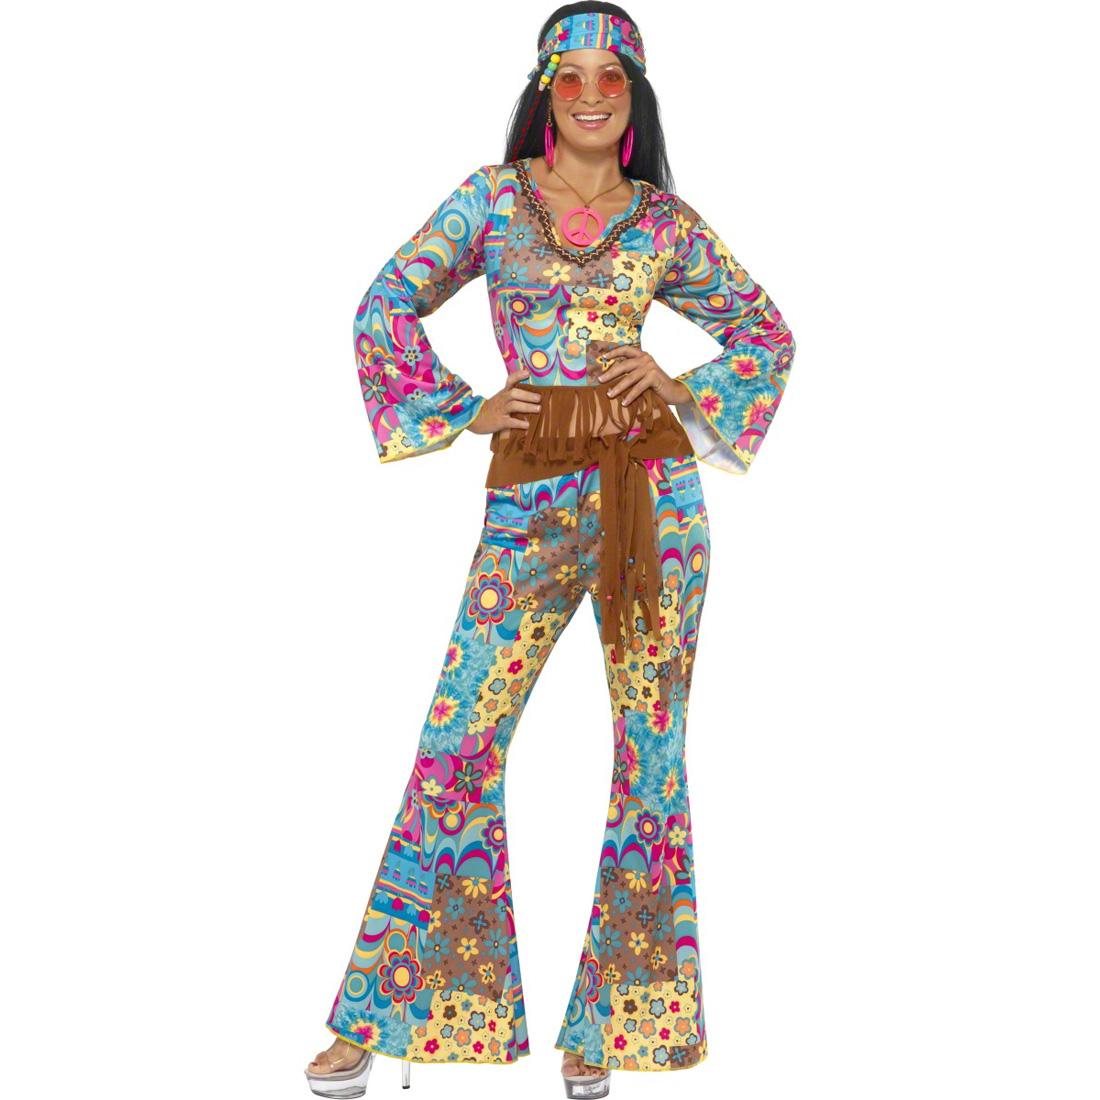 hippie kost m damen 70er jahre outfit flower power. Black Bedroom Furniture Sets. Home Design Ideas